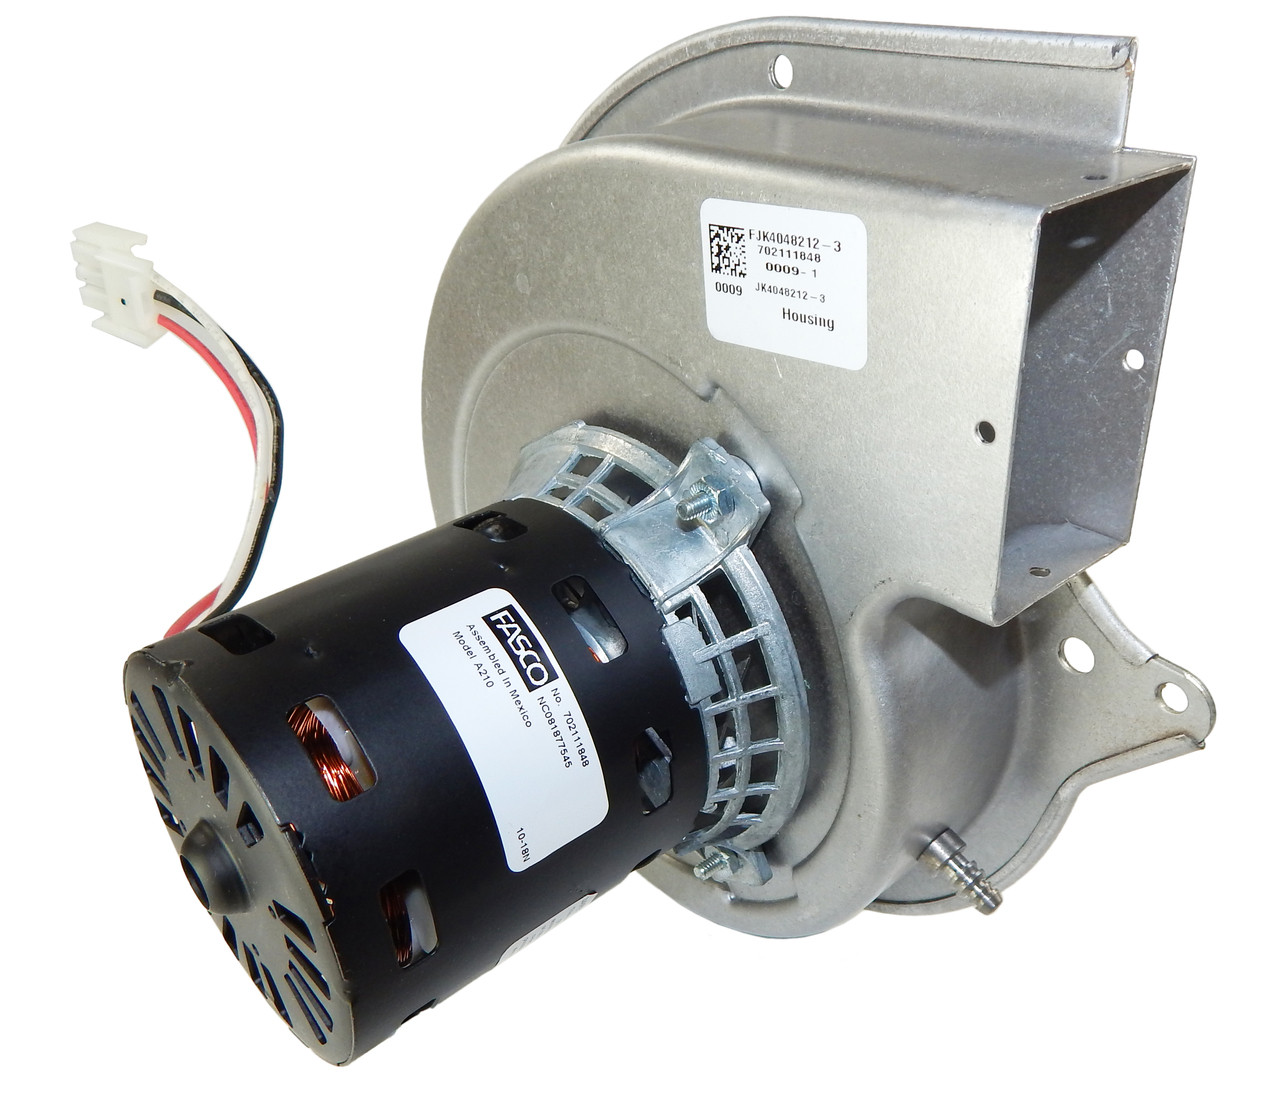 hight resolution of lennox furnace draft inducer blower 115v 7021 11063 18m67011 fasco a210